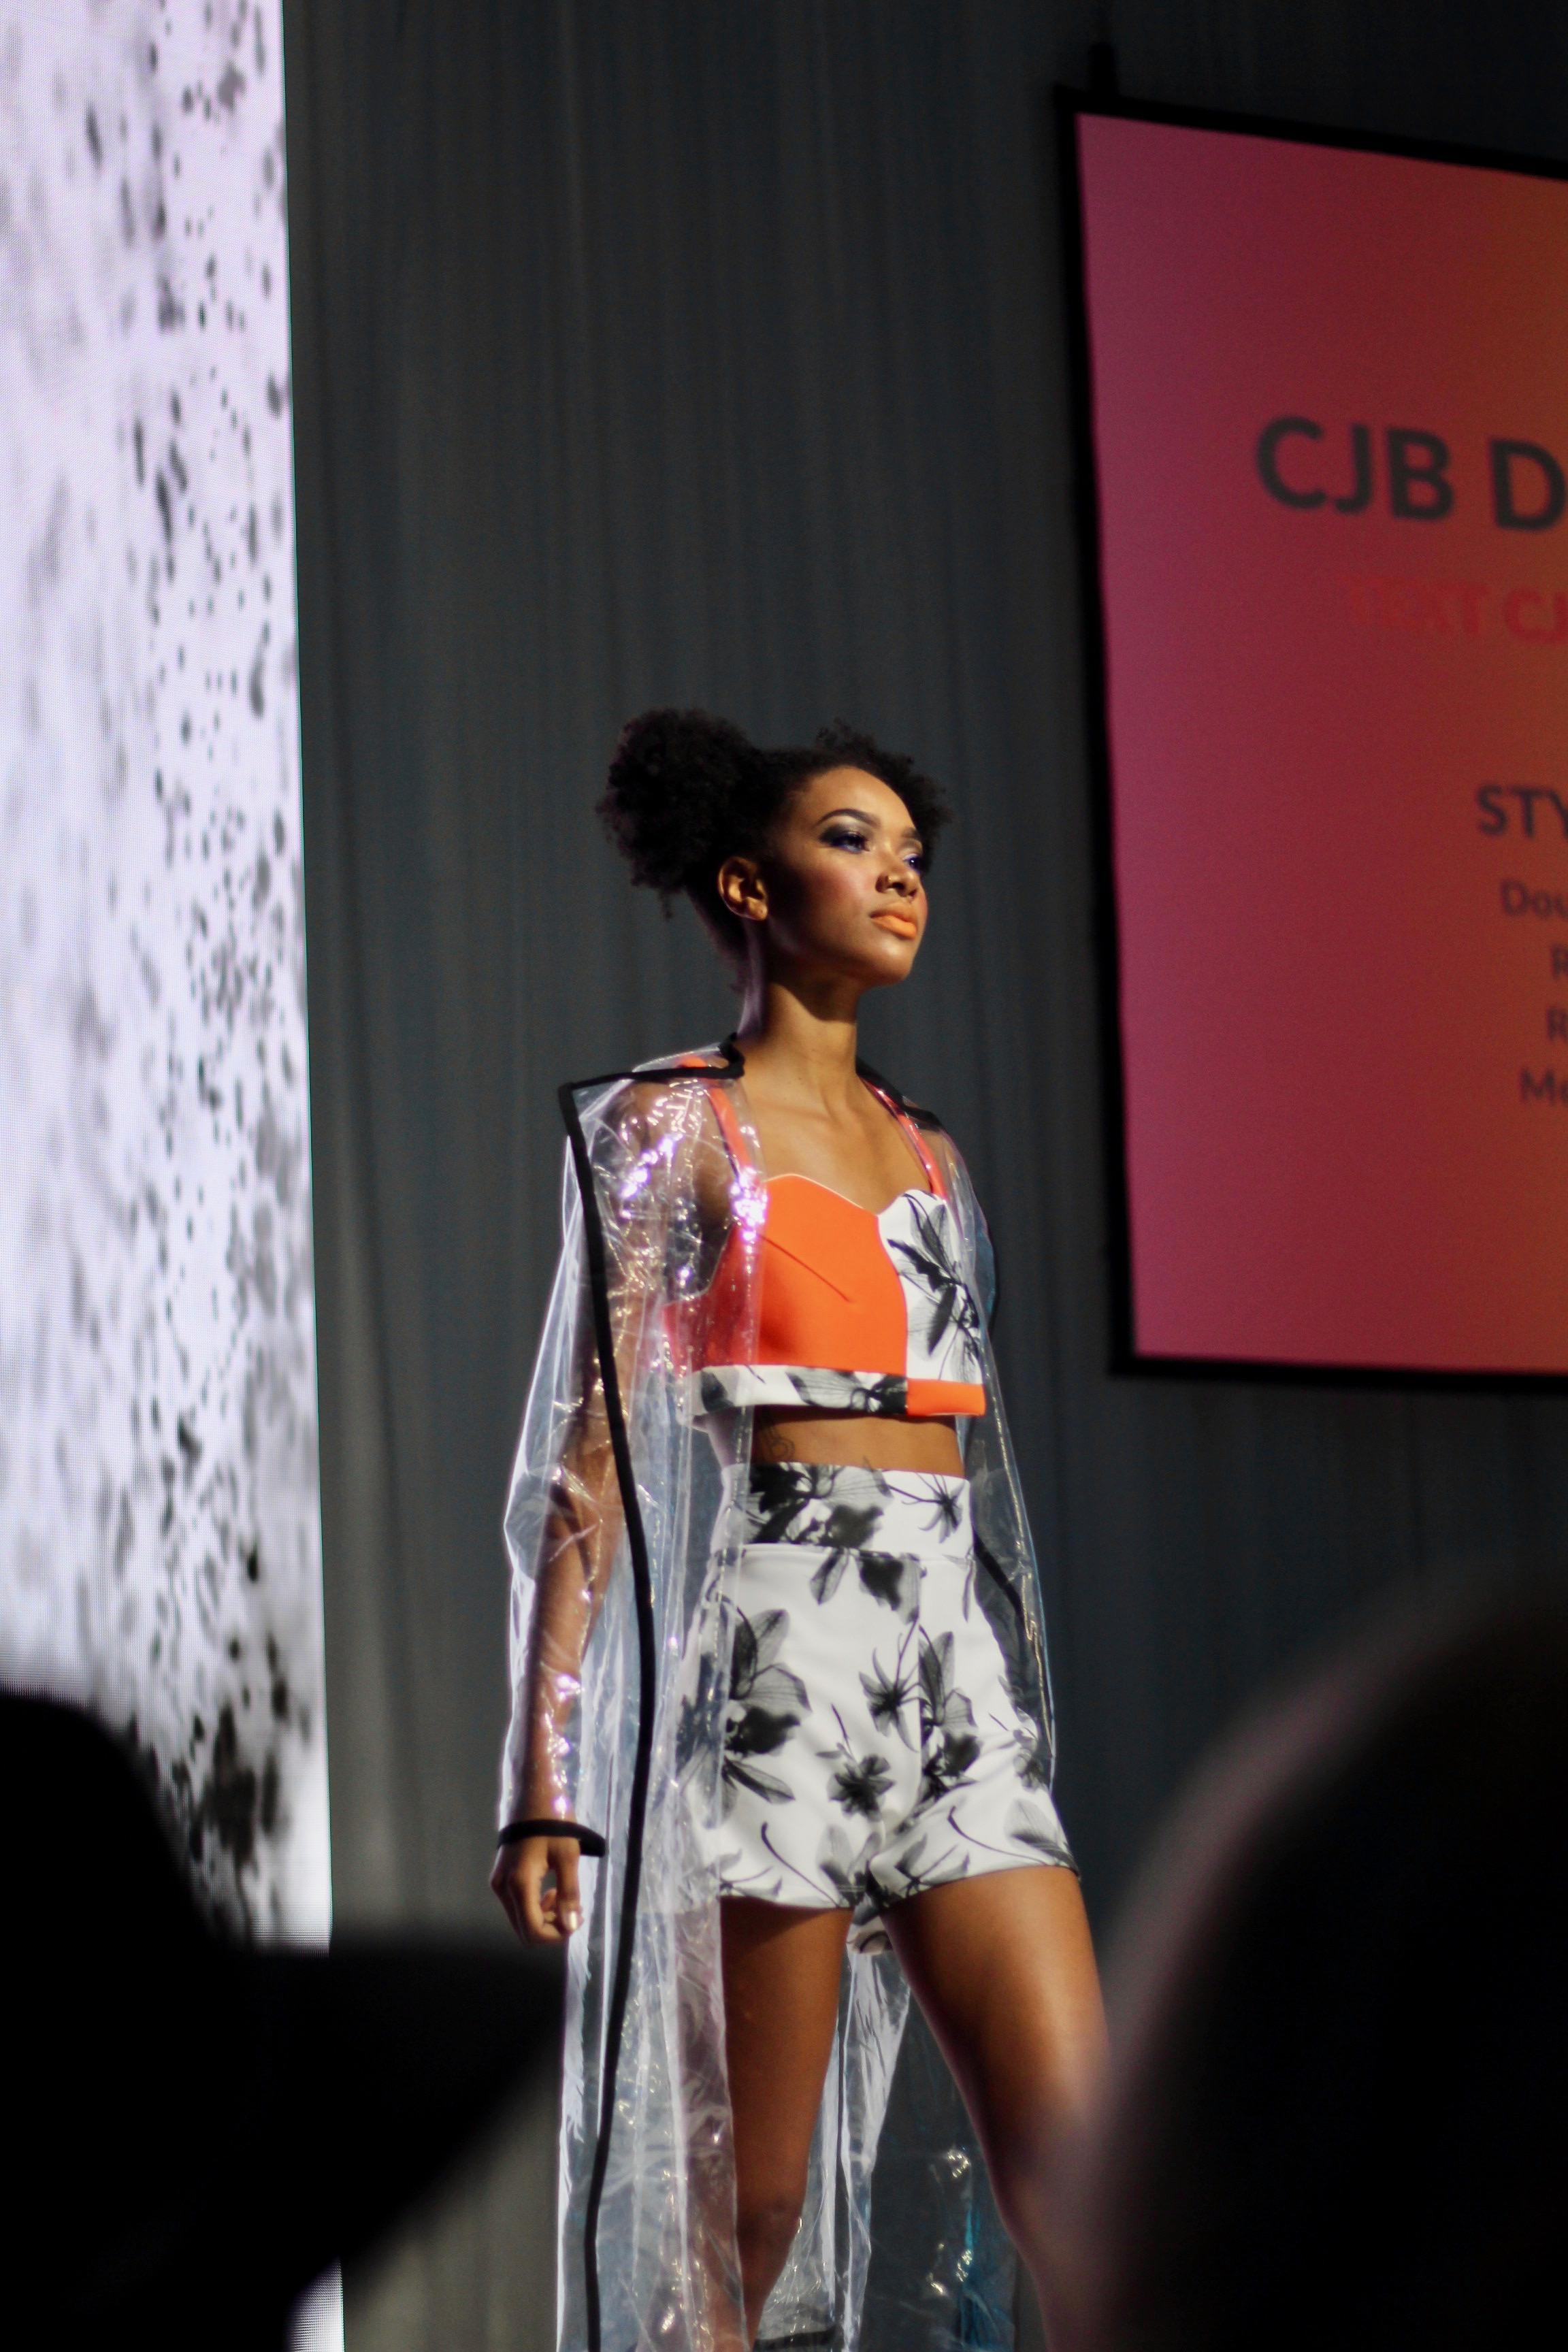 Omaha Fashion Week Fall 2018 | CJB Designs